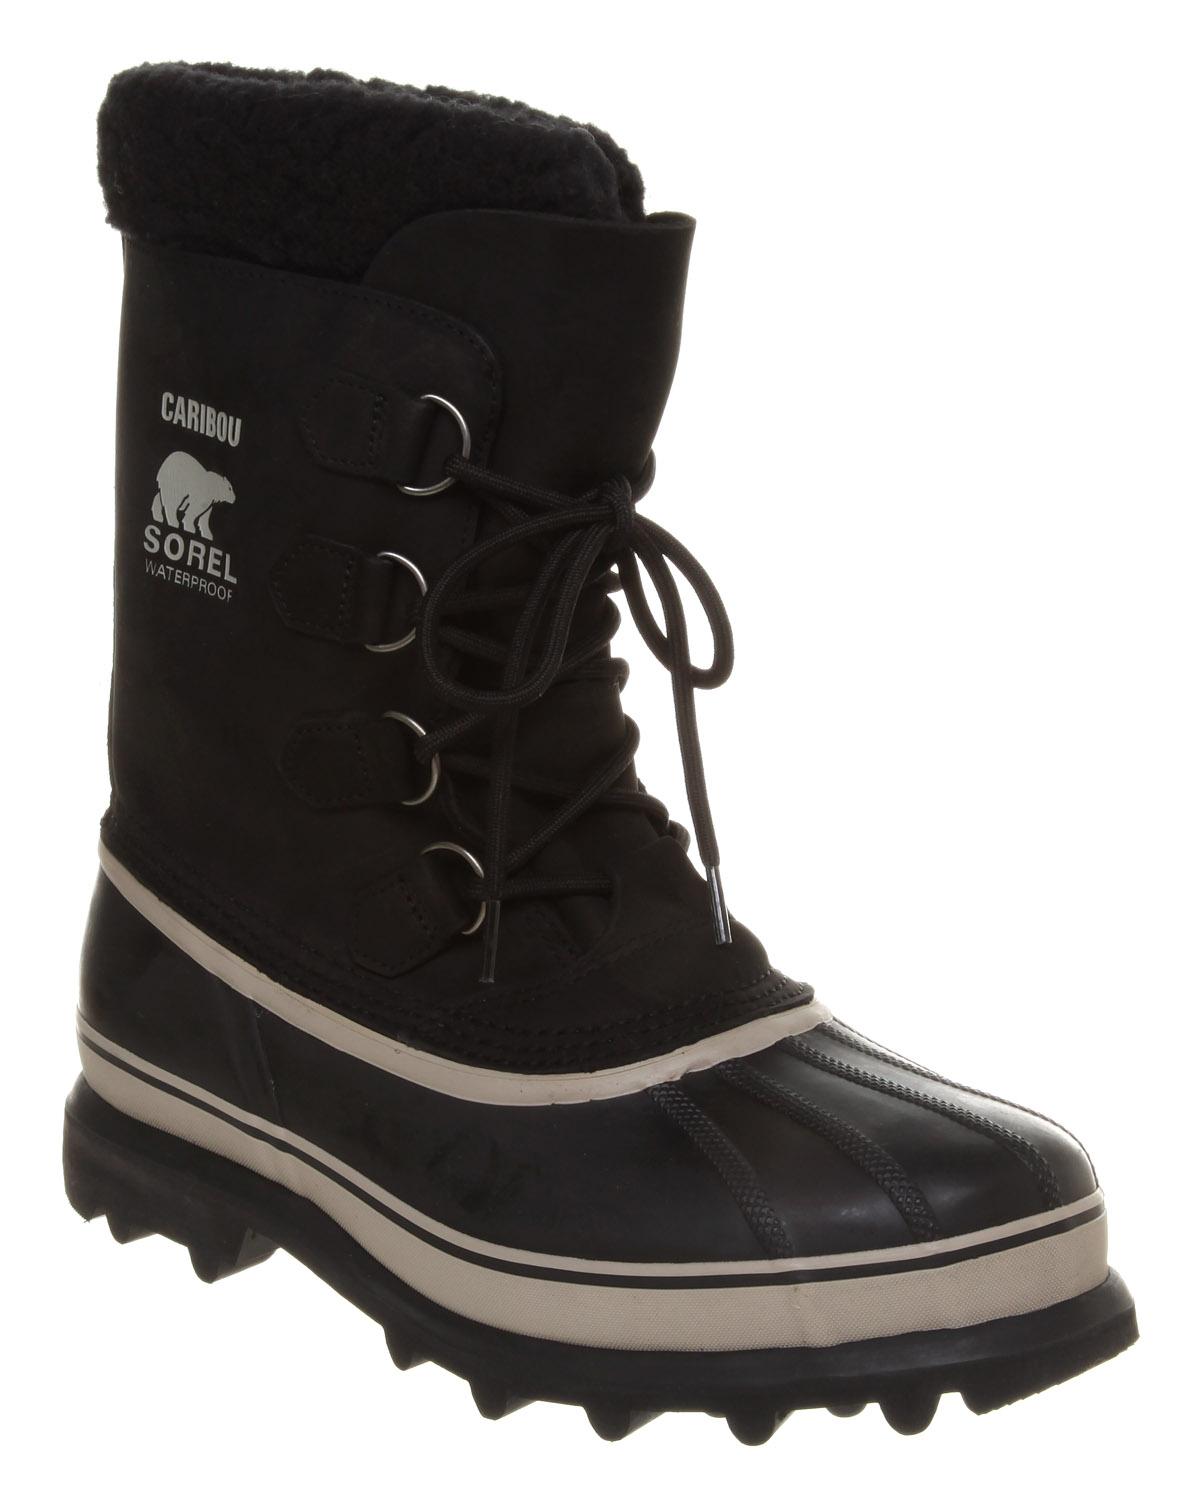 Mens-Sorel-Caribou-Nubuck-High-Lace-Black-Nubuck-Boots